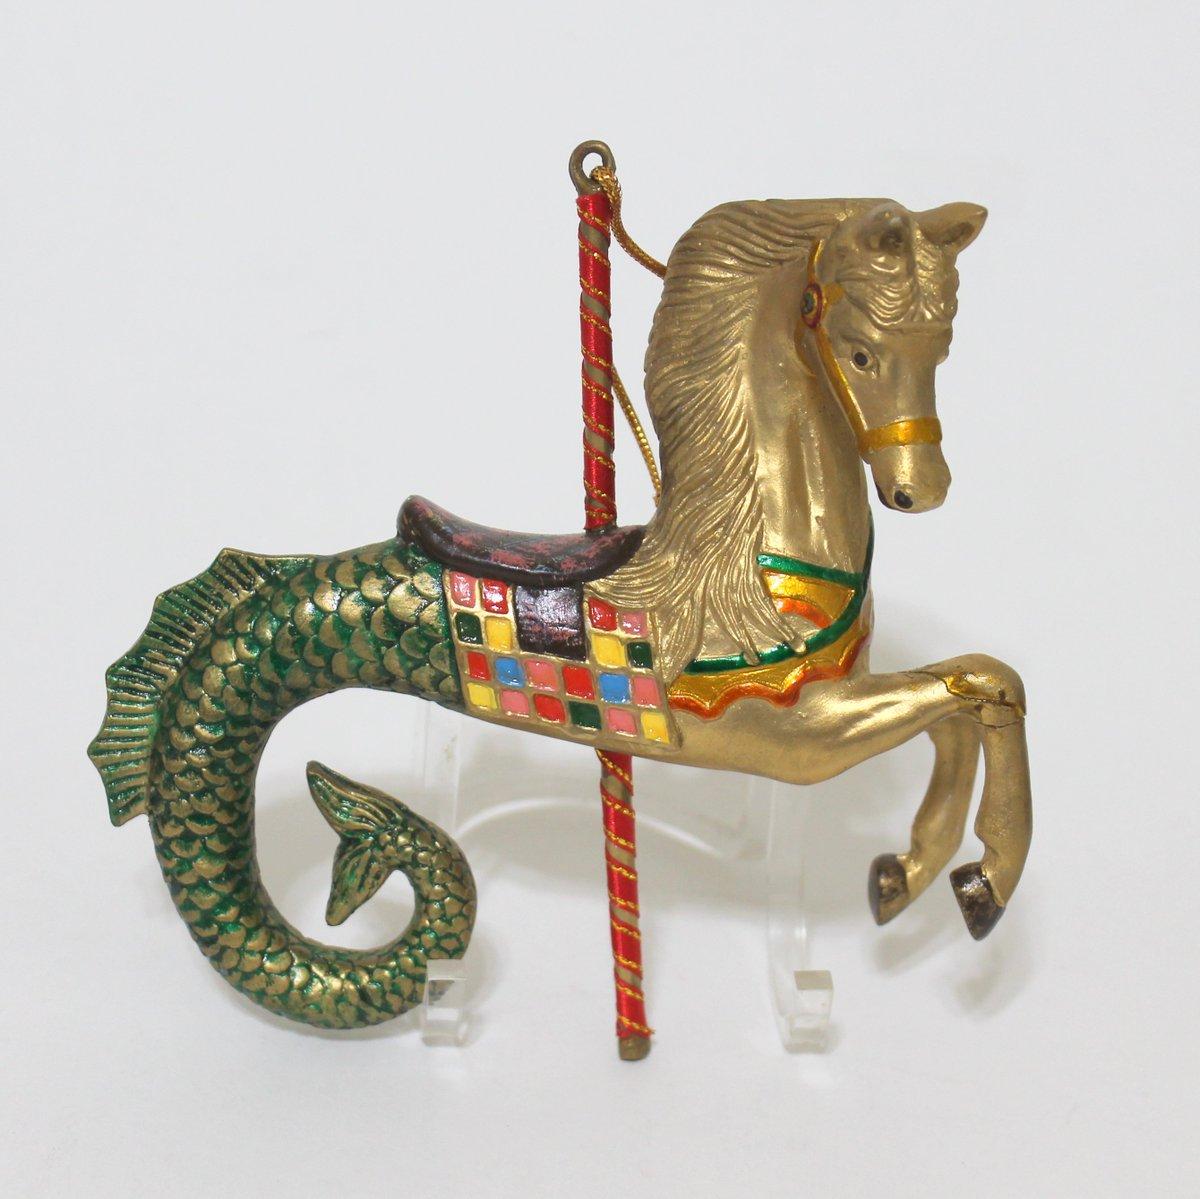 Kurt Adler 2019 Carousel Sea Horse ornament